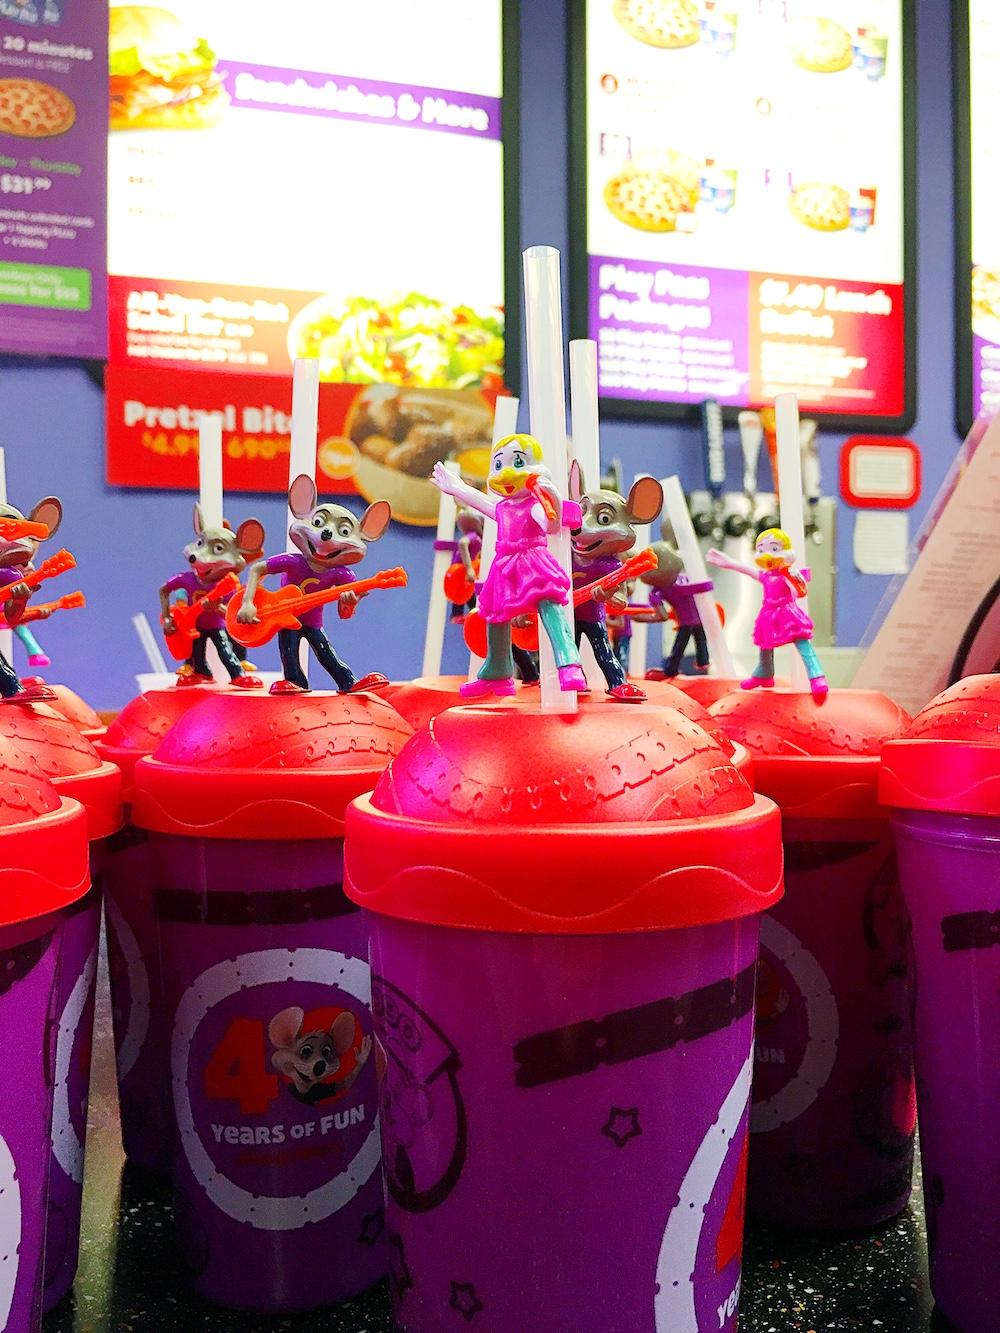 Souvenir cups at Chuck E. Cheese's - LivingMiVidaLoca.com